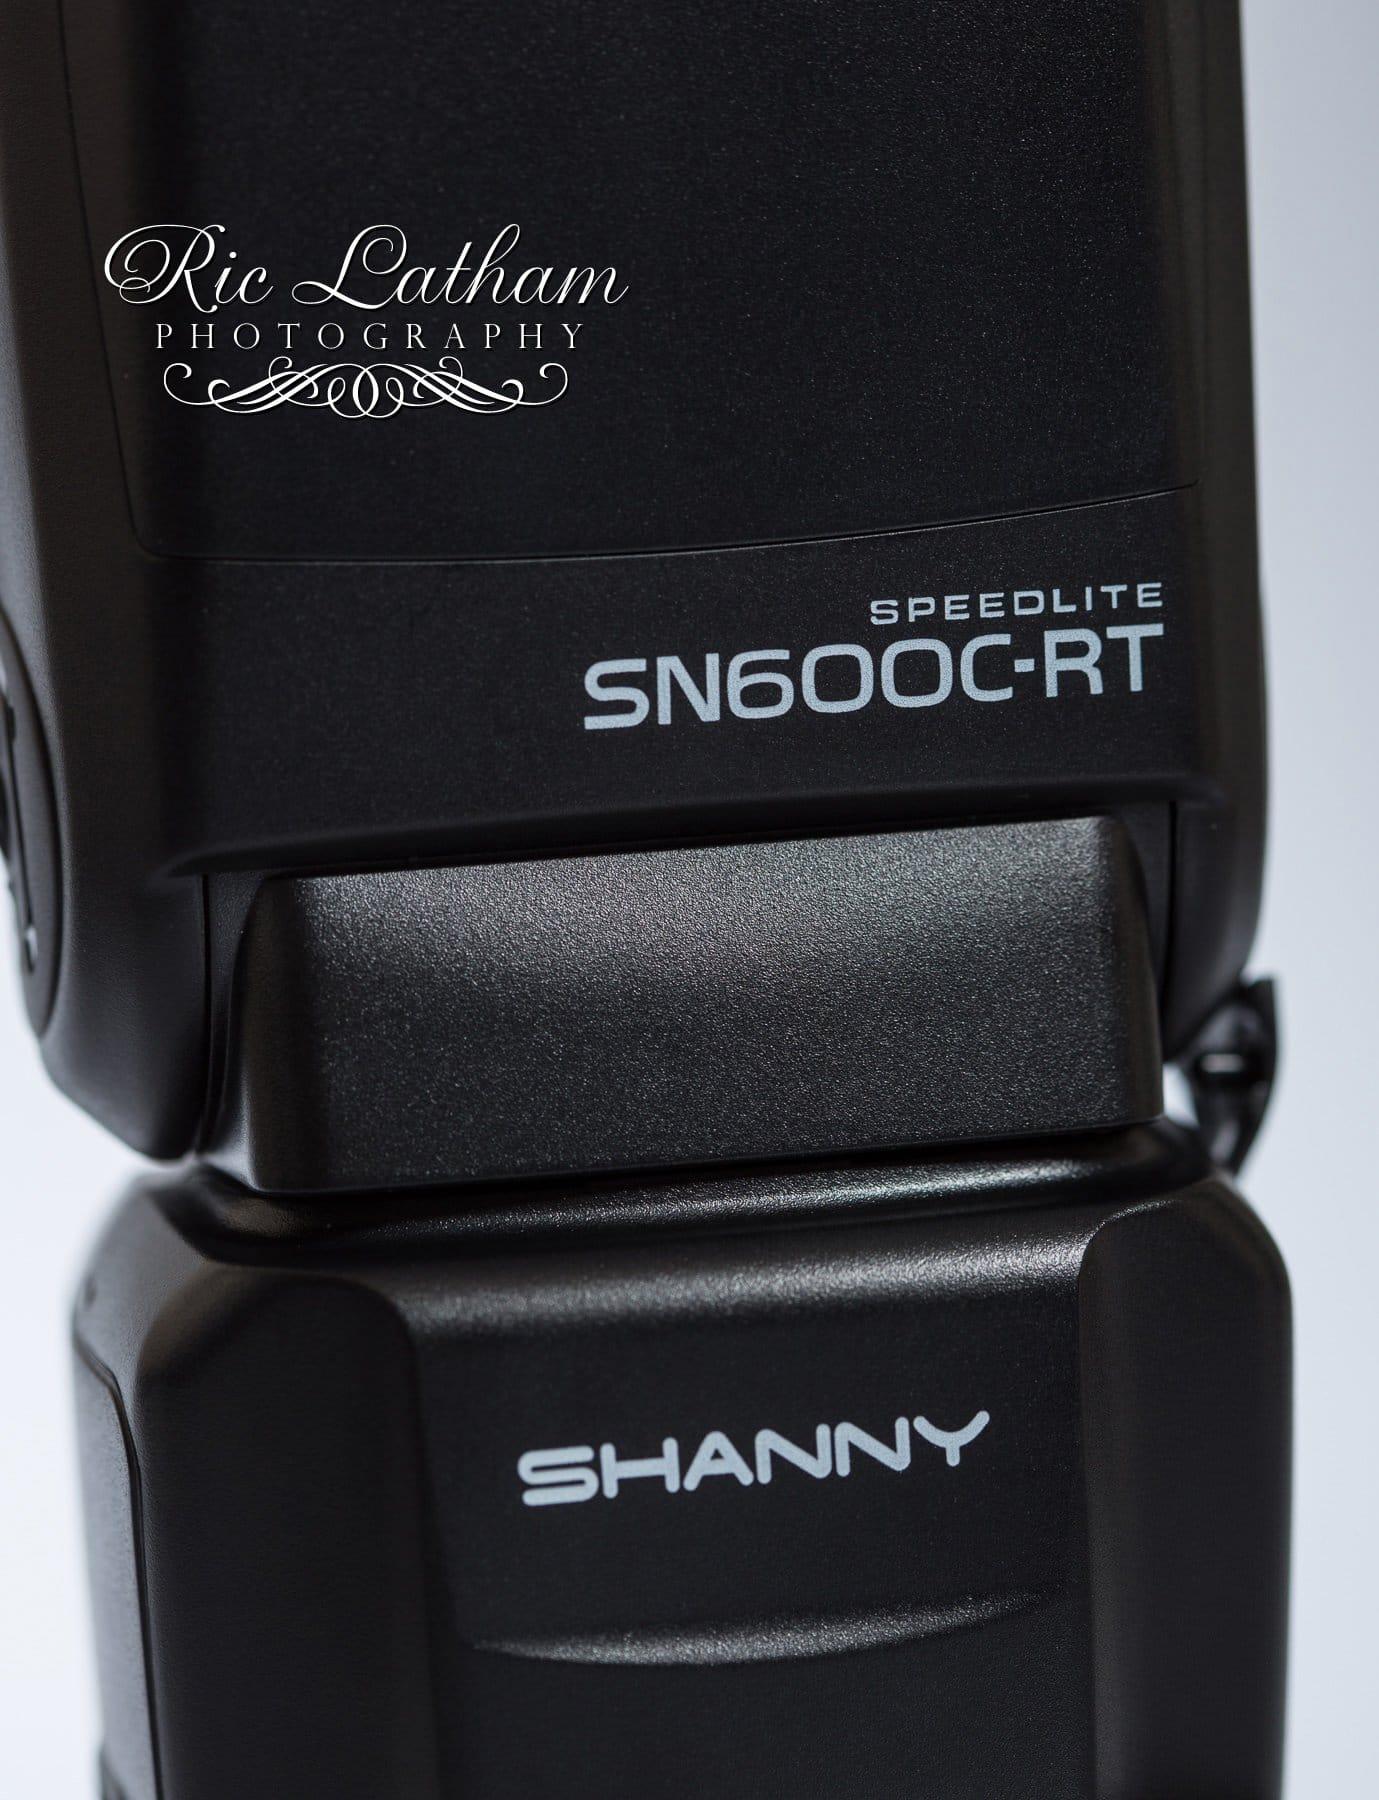 shanny-SN600C-RT-0015